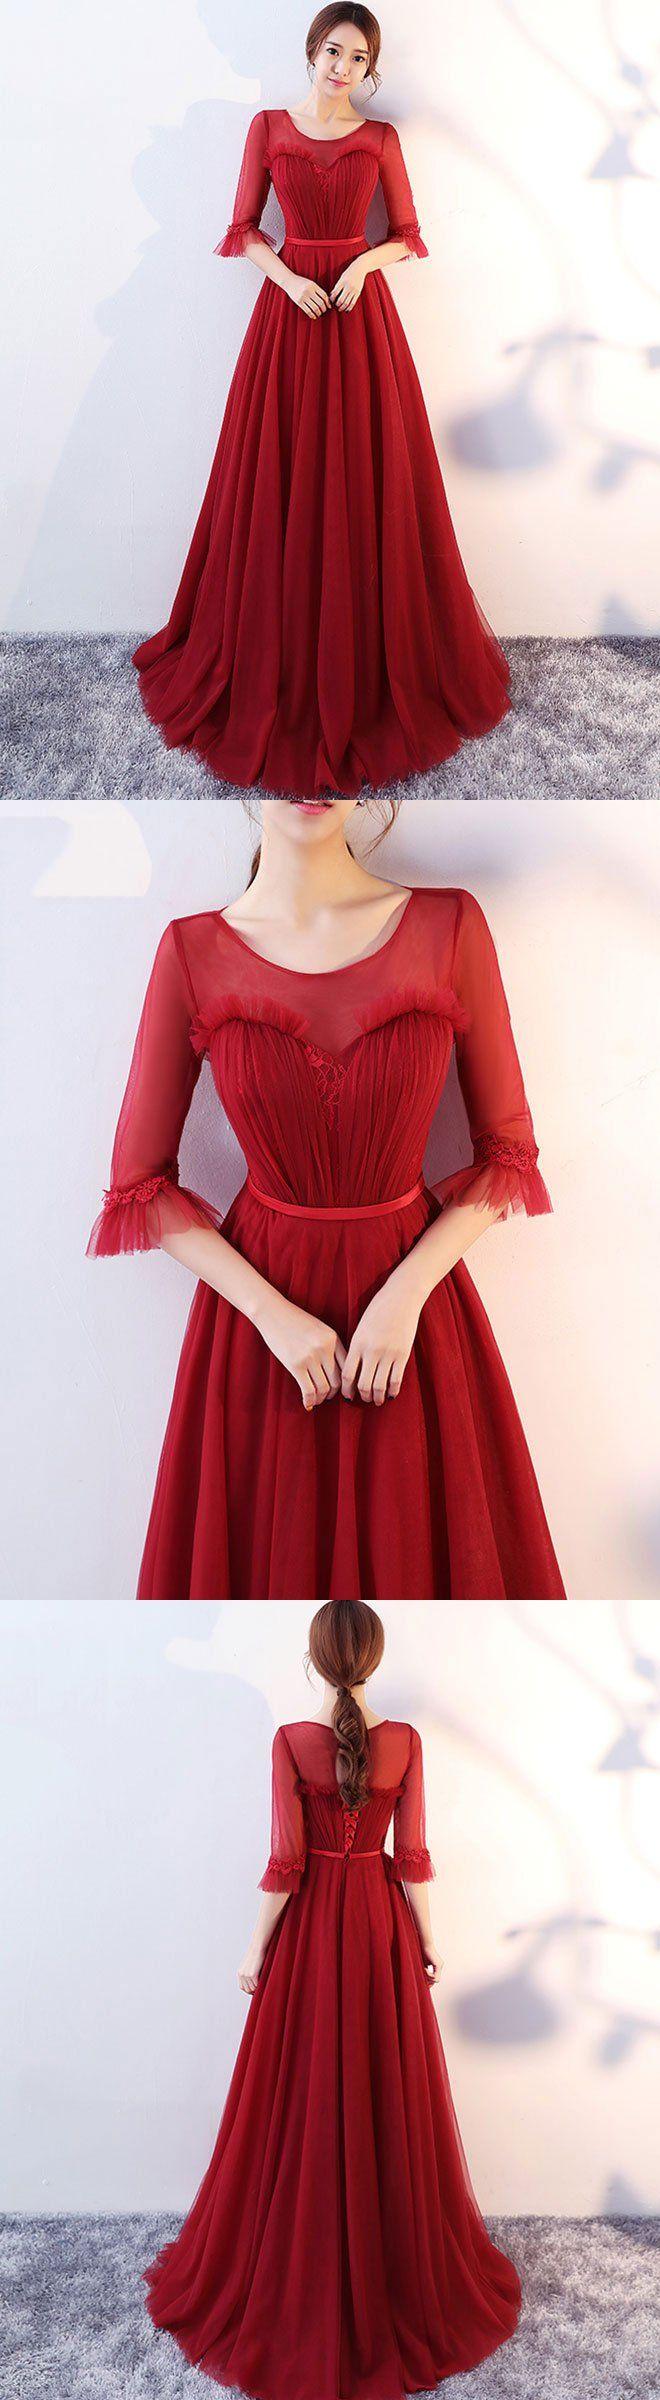 Burgundy round neck tulle long prom dress evening dress long prom